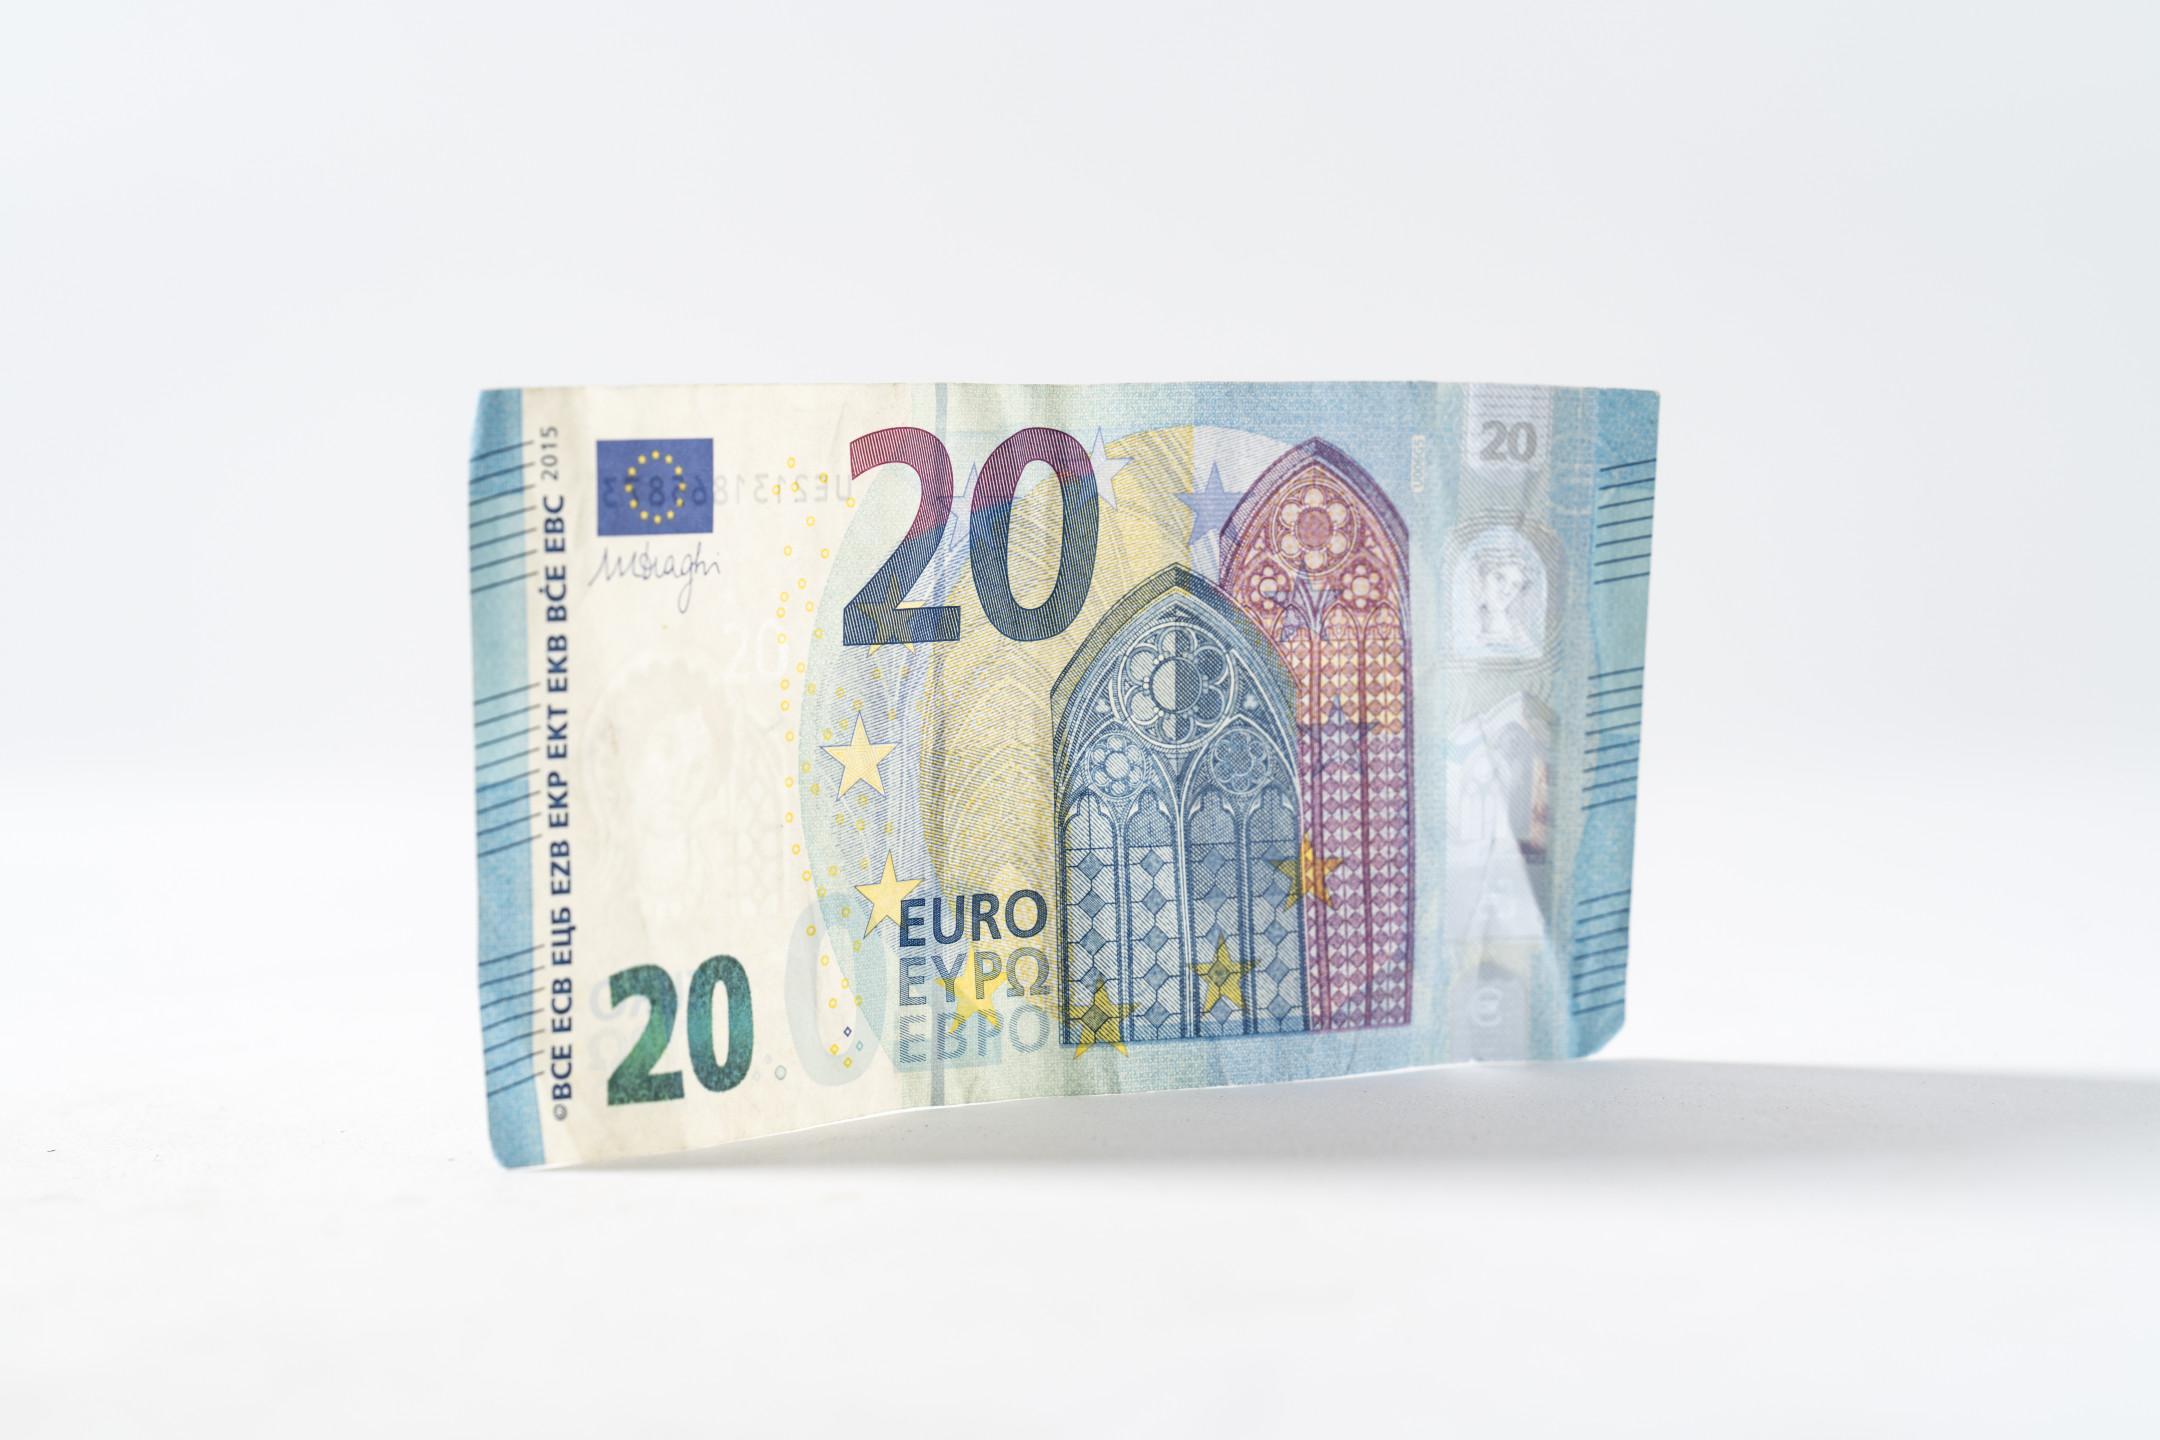 EURUSD analysis - Euro moves higher against US dollar